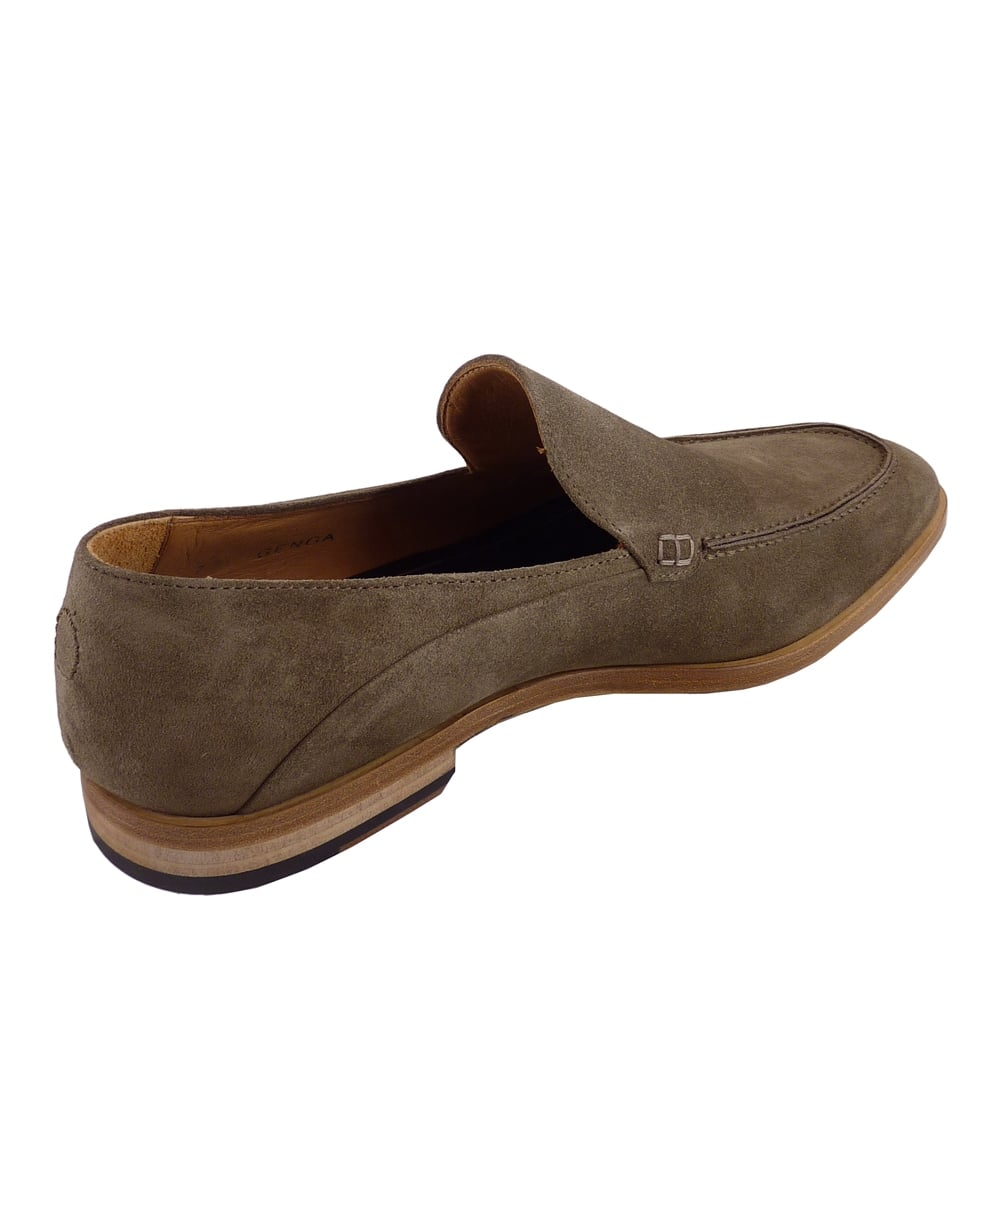 genoa sand suede slip on shoe